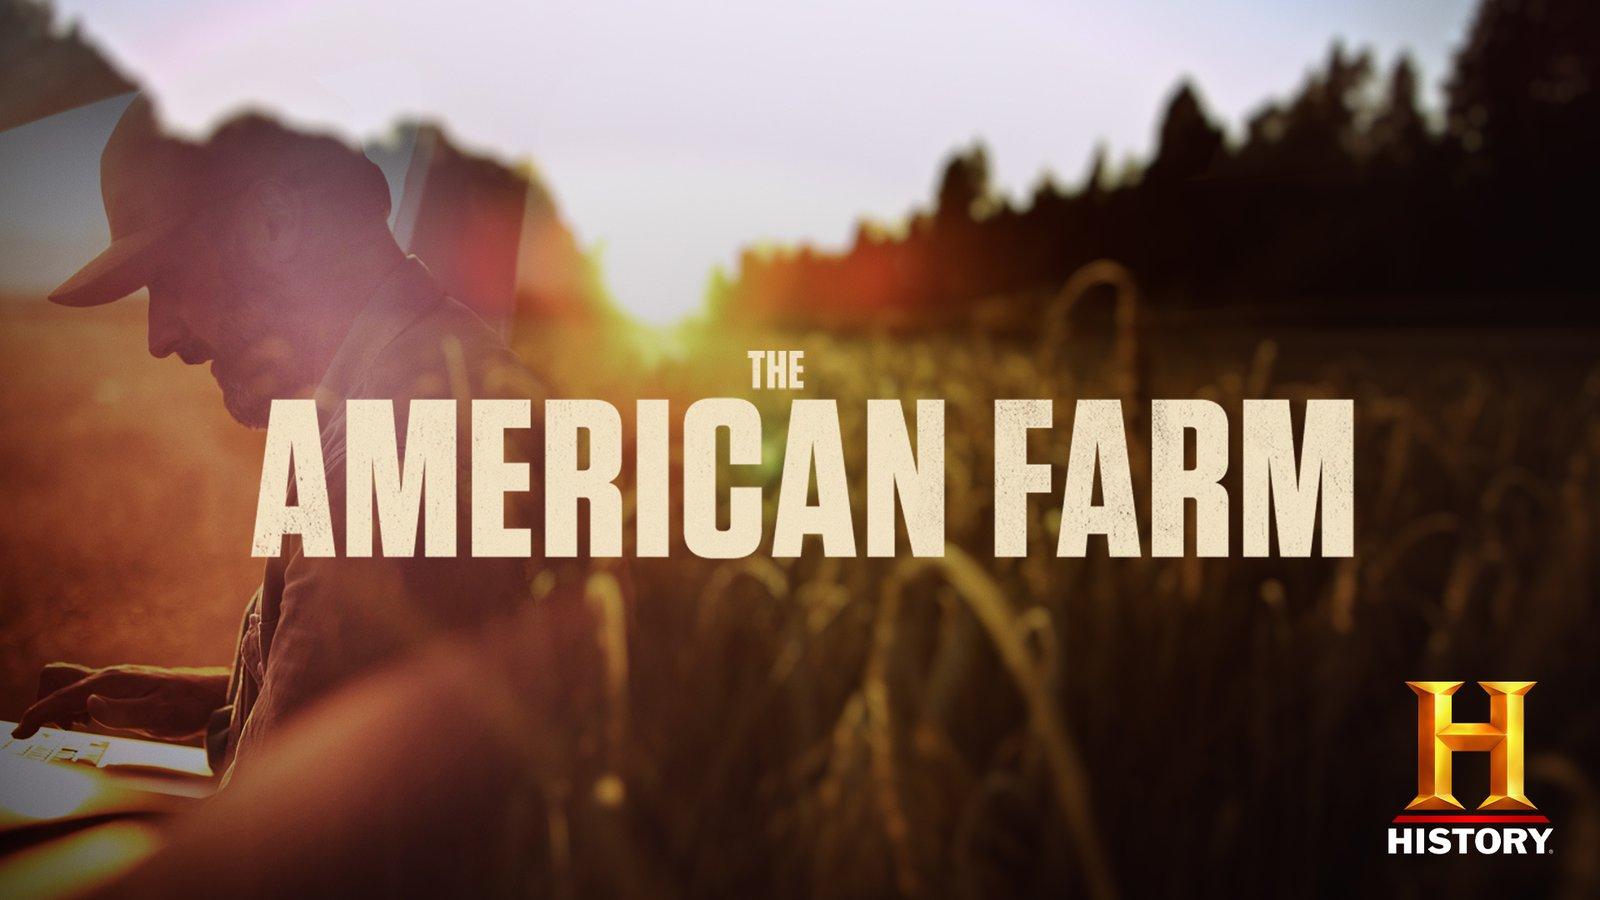 The American Farm